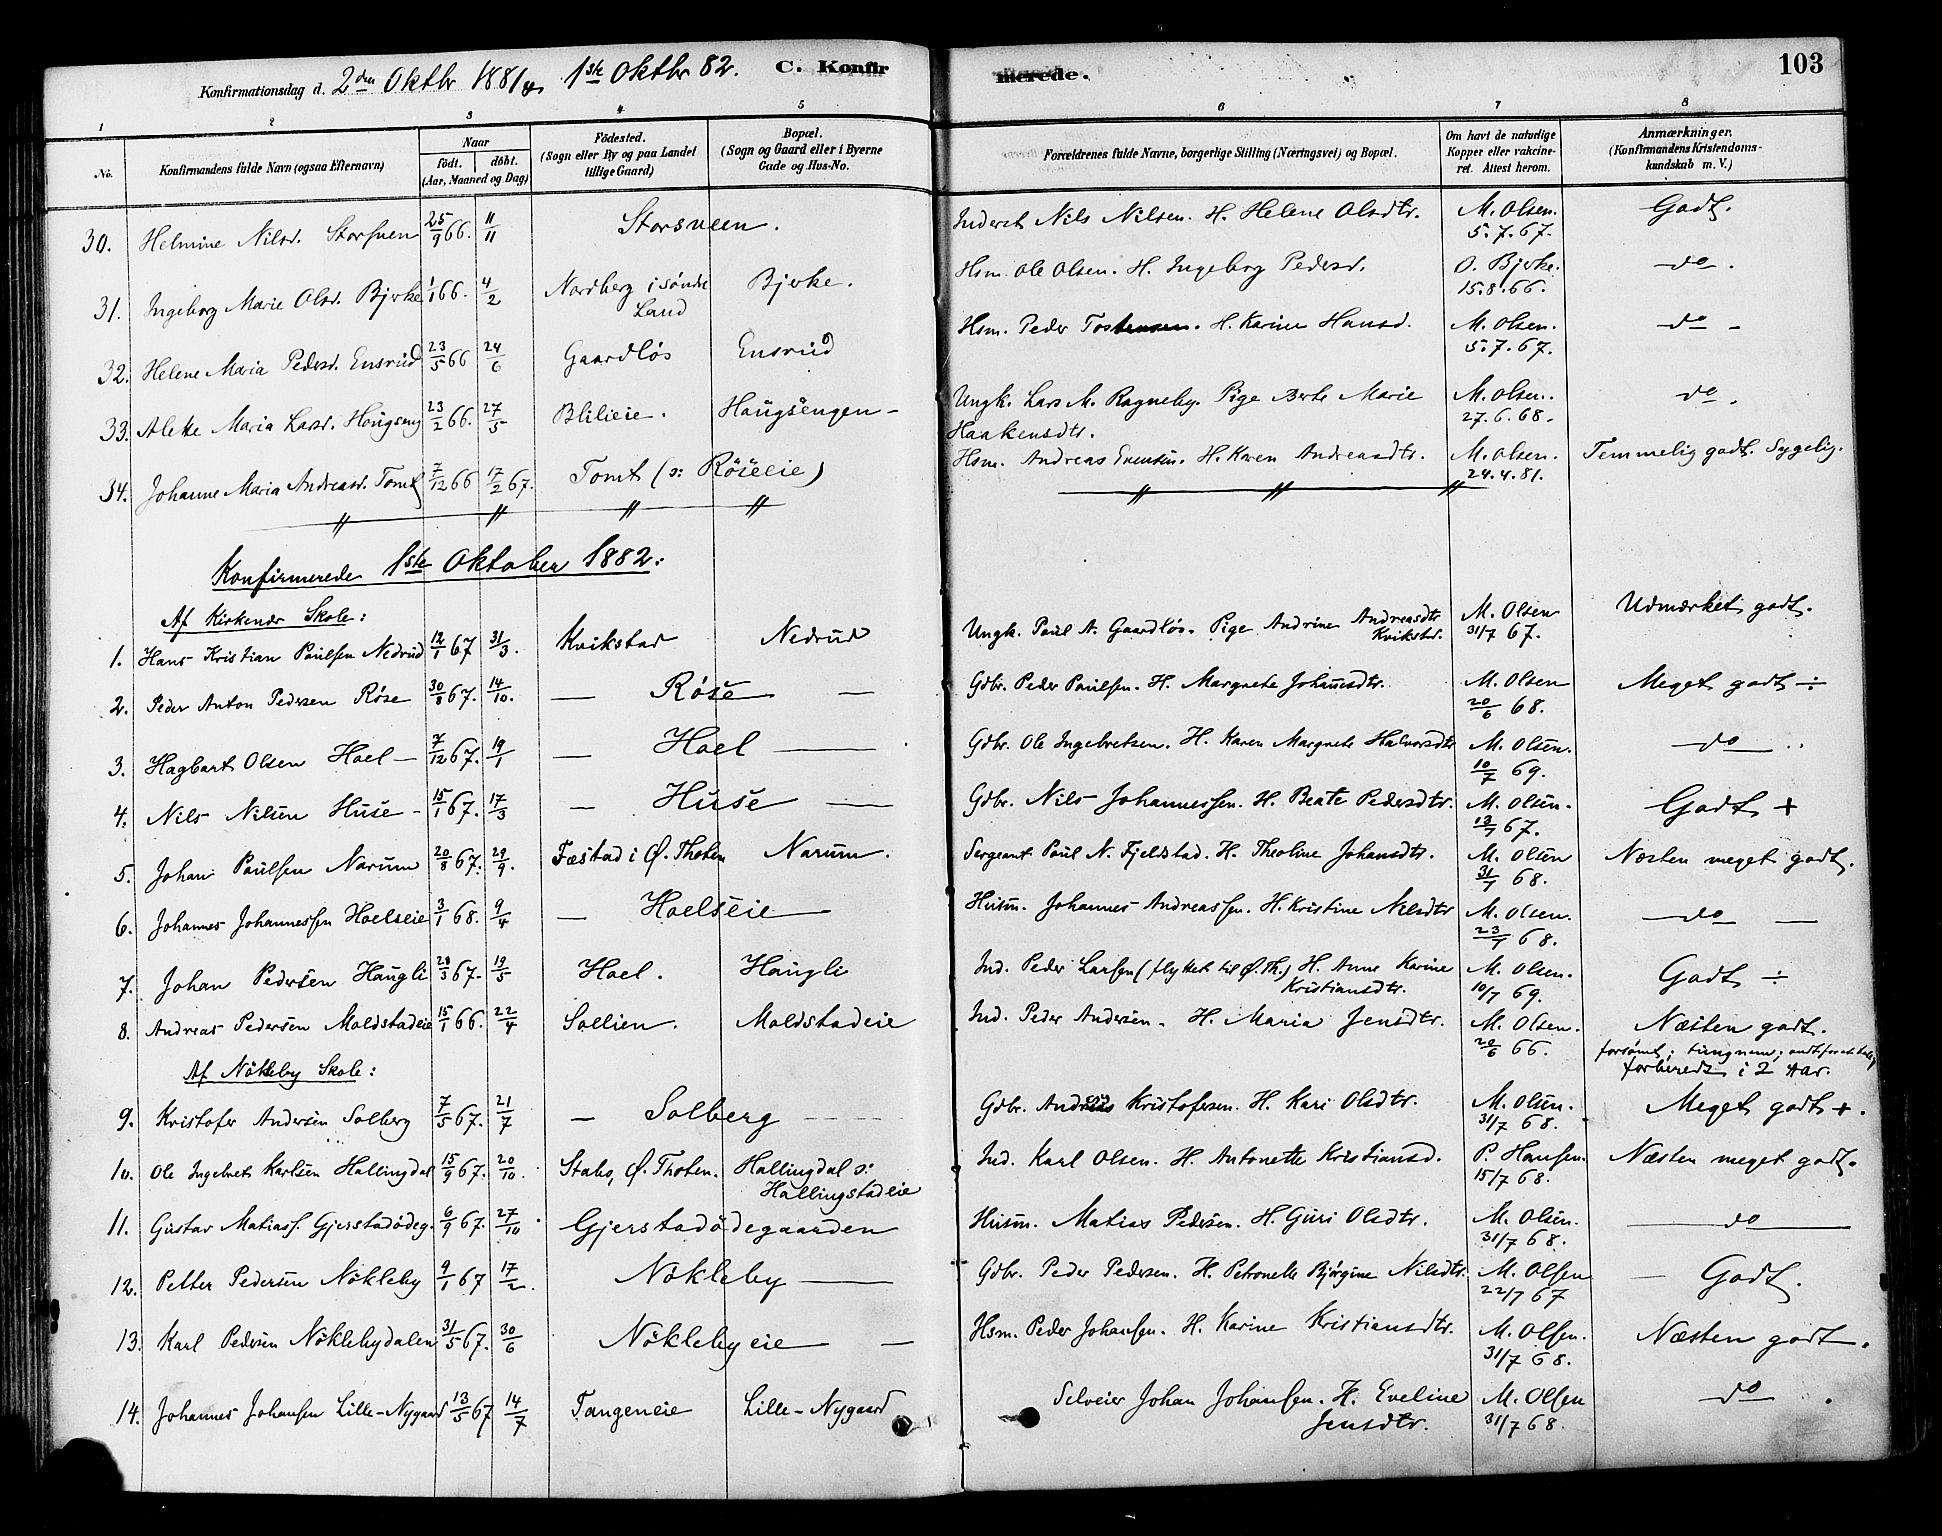 SAH, Vestre Toten prestekontor, H/Ha/Haa/L0010: Ministerialbok nr. 10, 1878-1894, s. 103